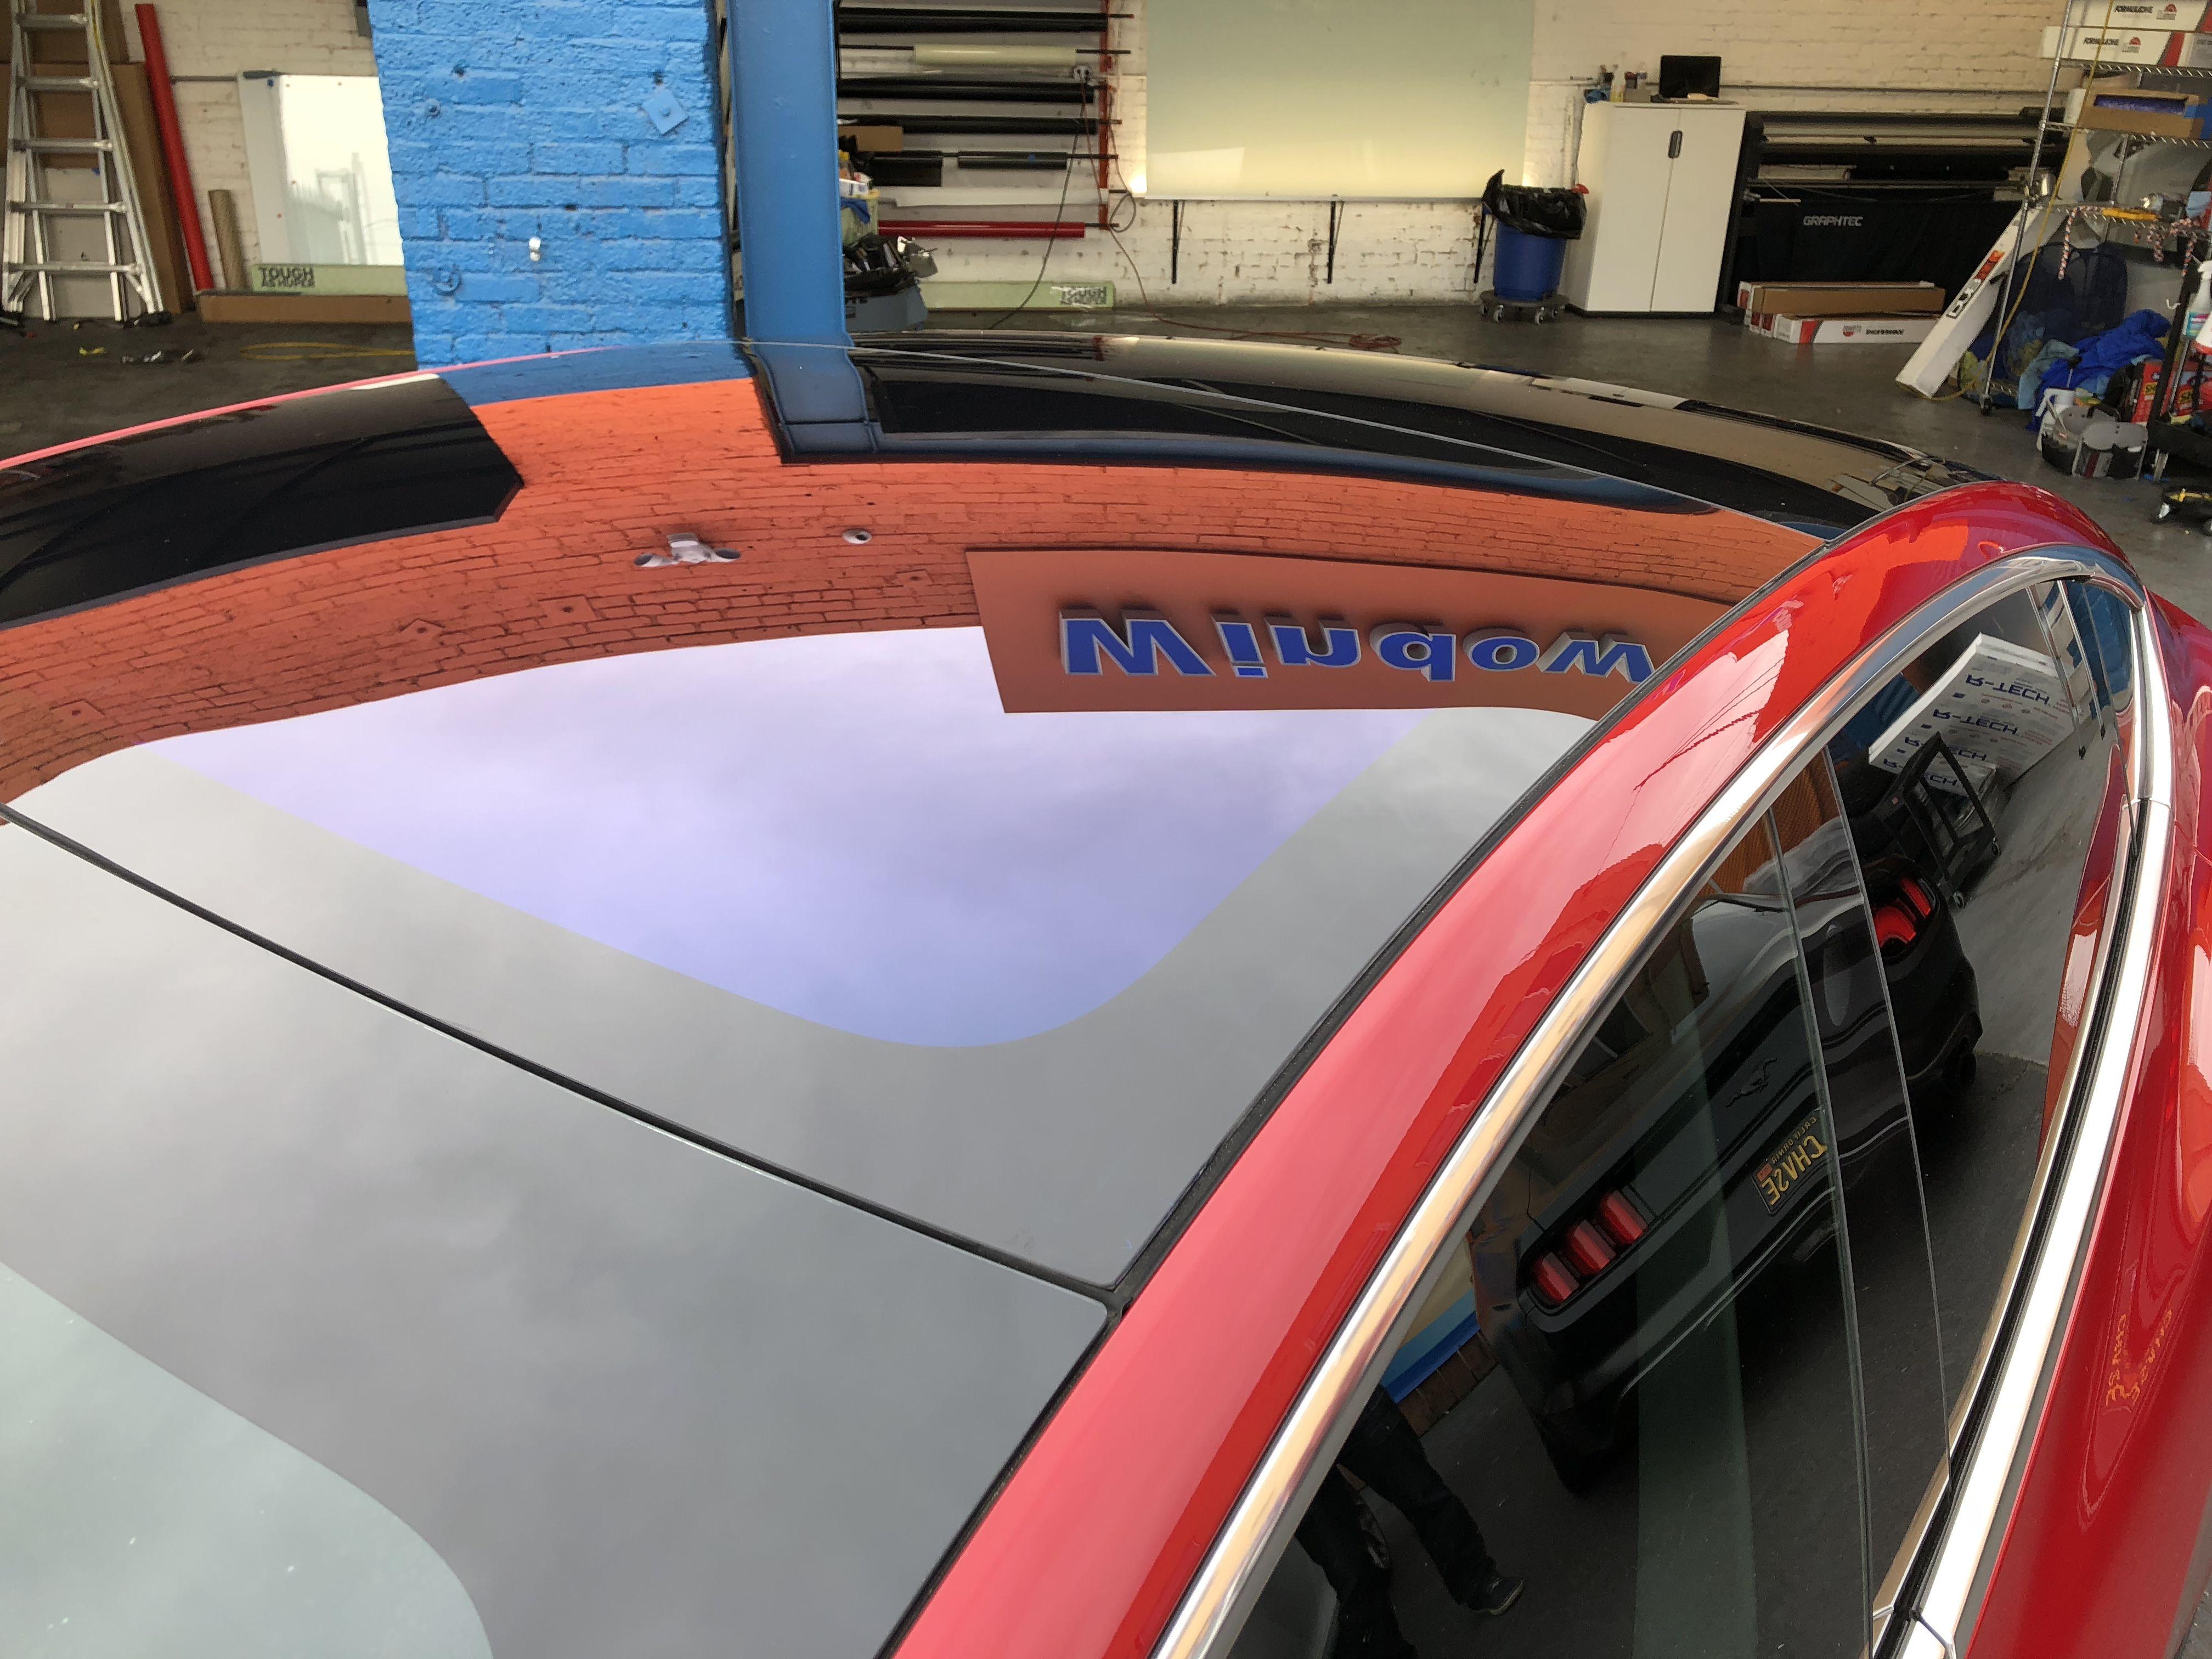 Huper Optik Ceramic Tint 70 Applied To The Sunroof Of This Tesla Model 3 Tinted Windows Tints Tesla Model